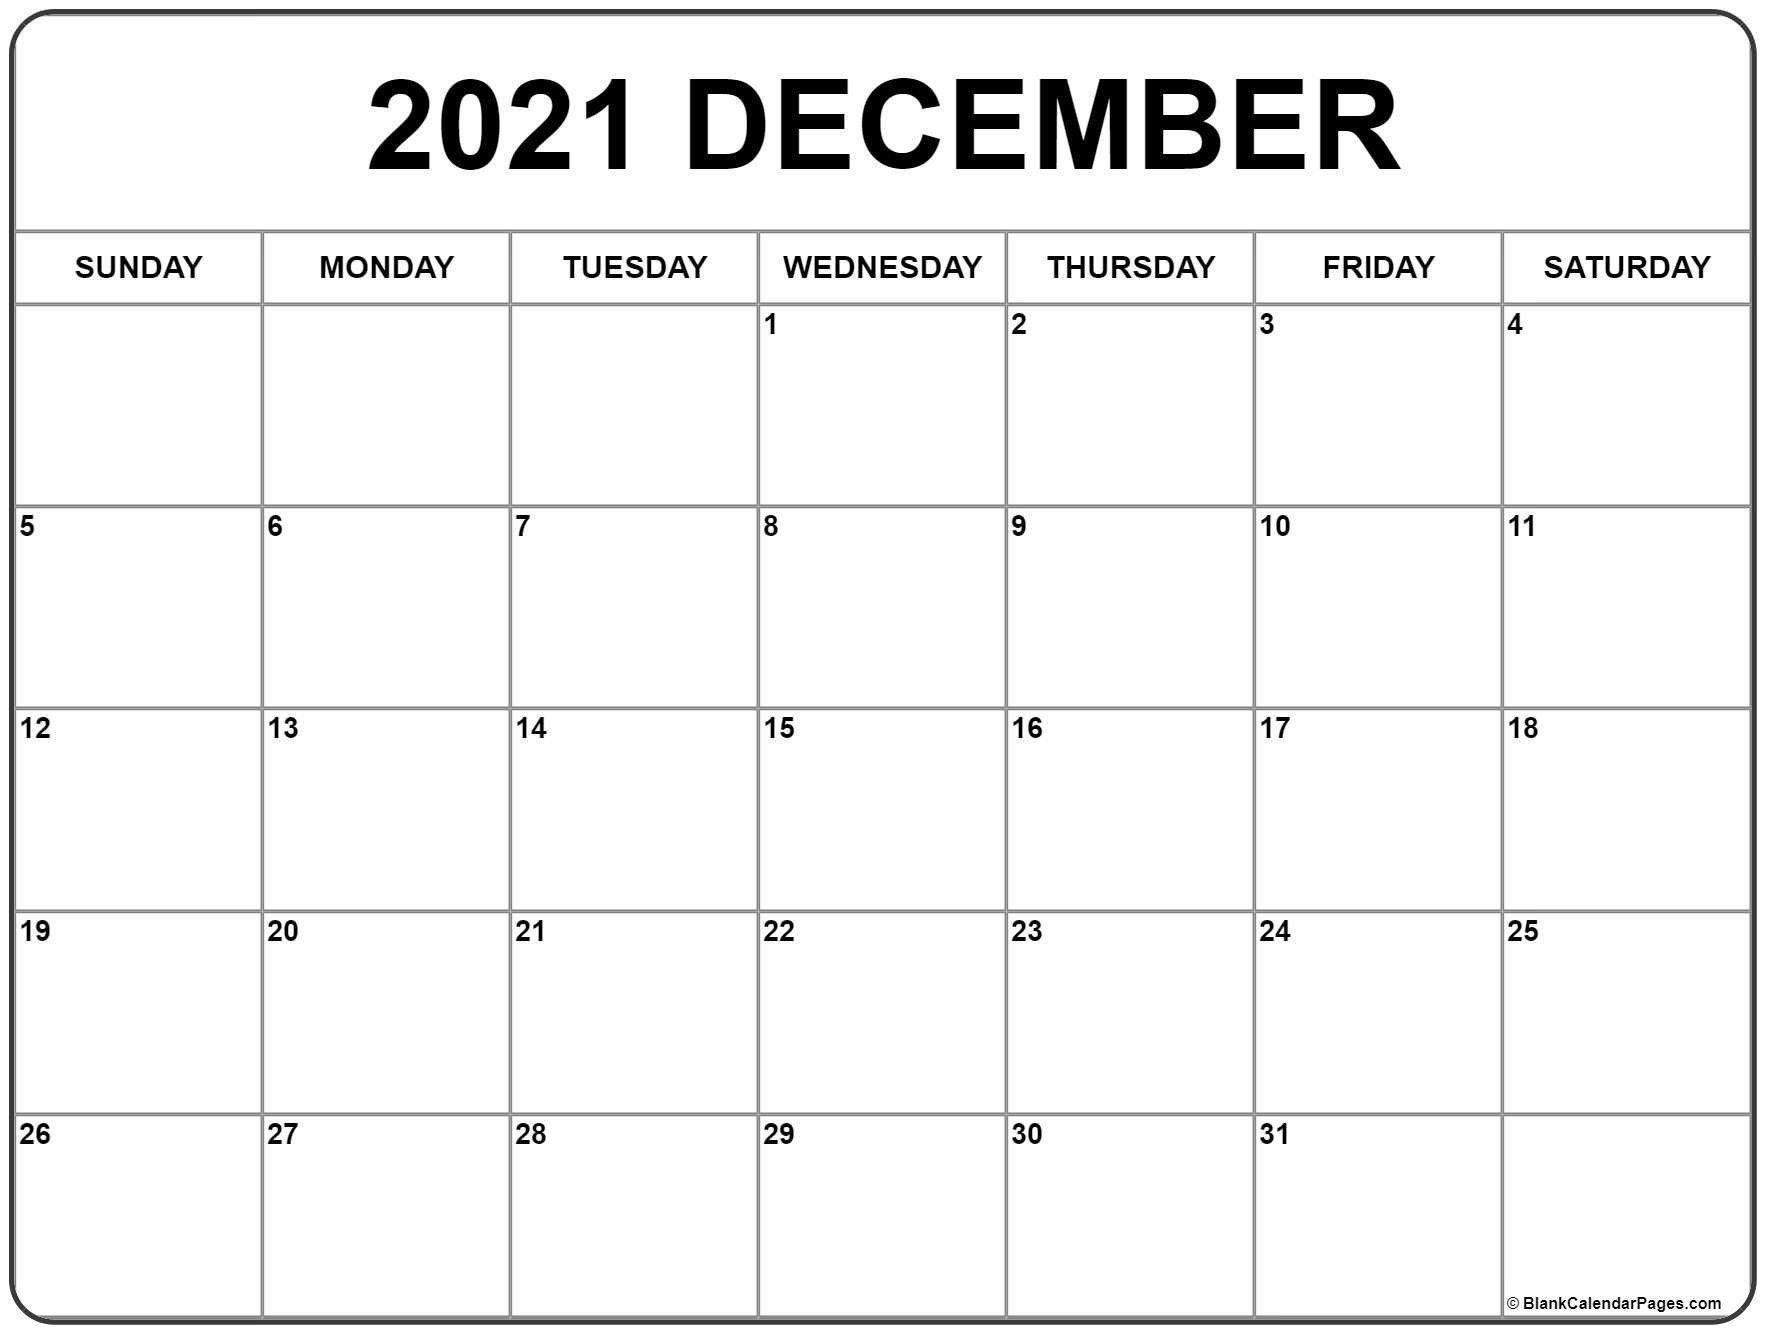 Get Cute Printable Pdf December 2021 Calander